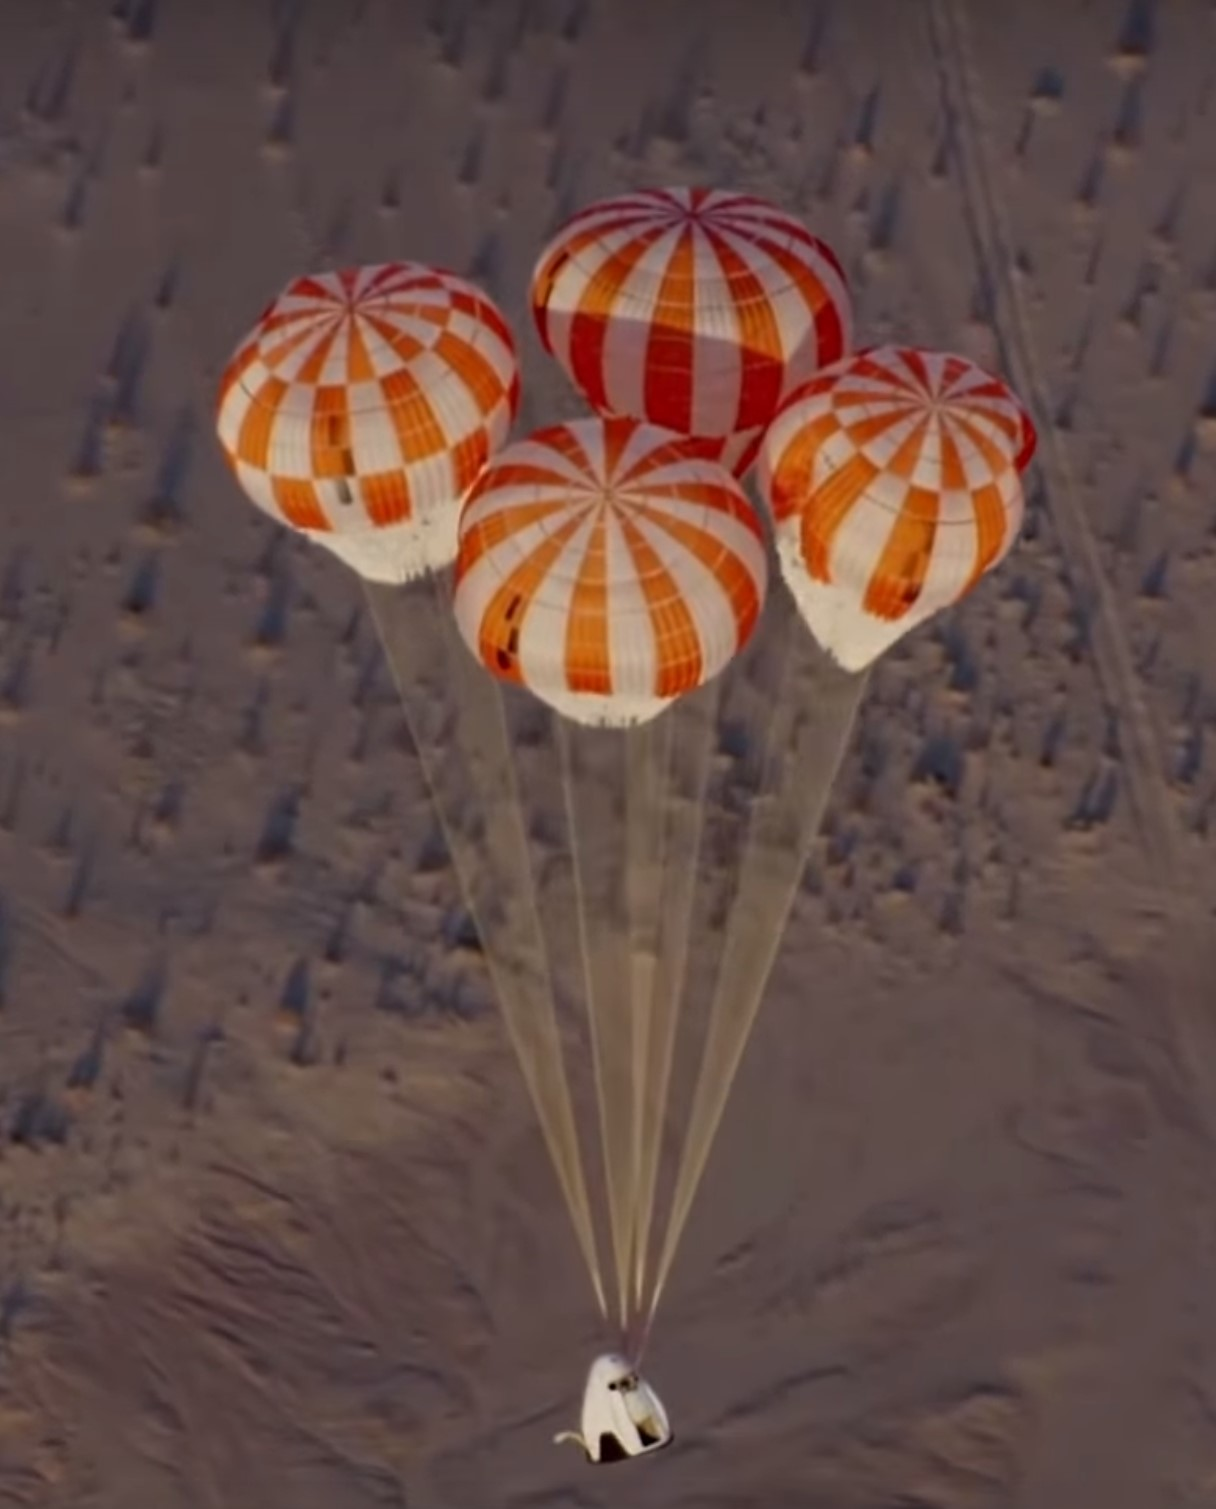 Crew Dragon parachute test (SpaceX)